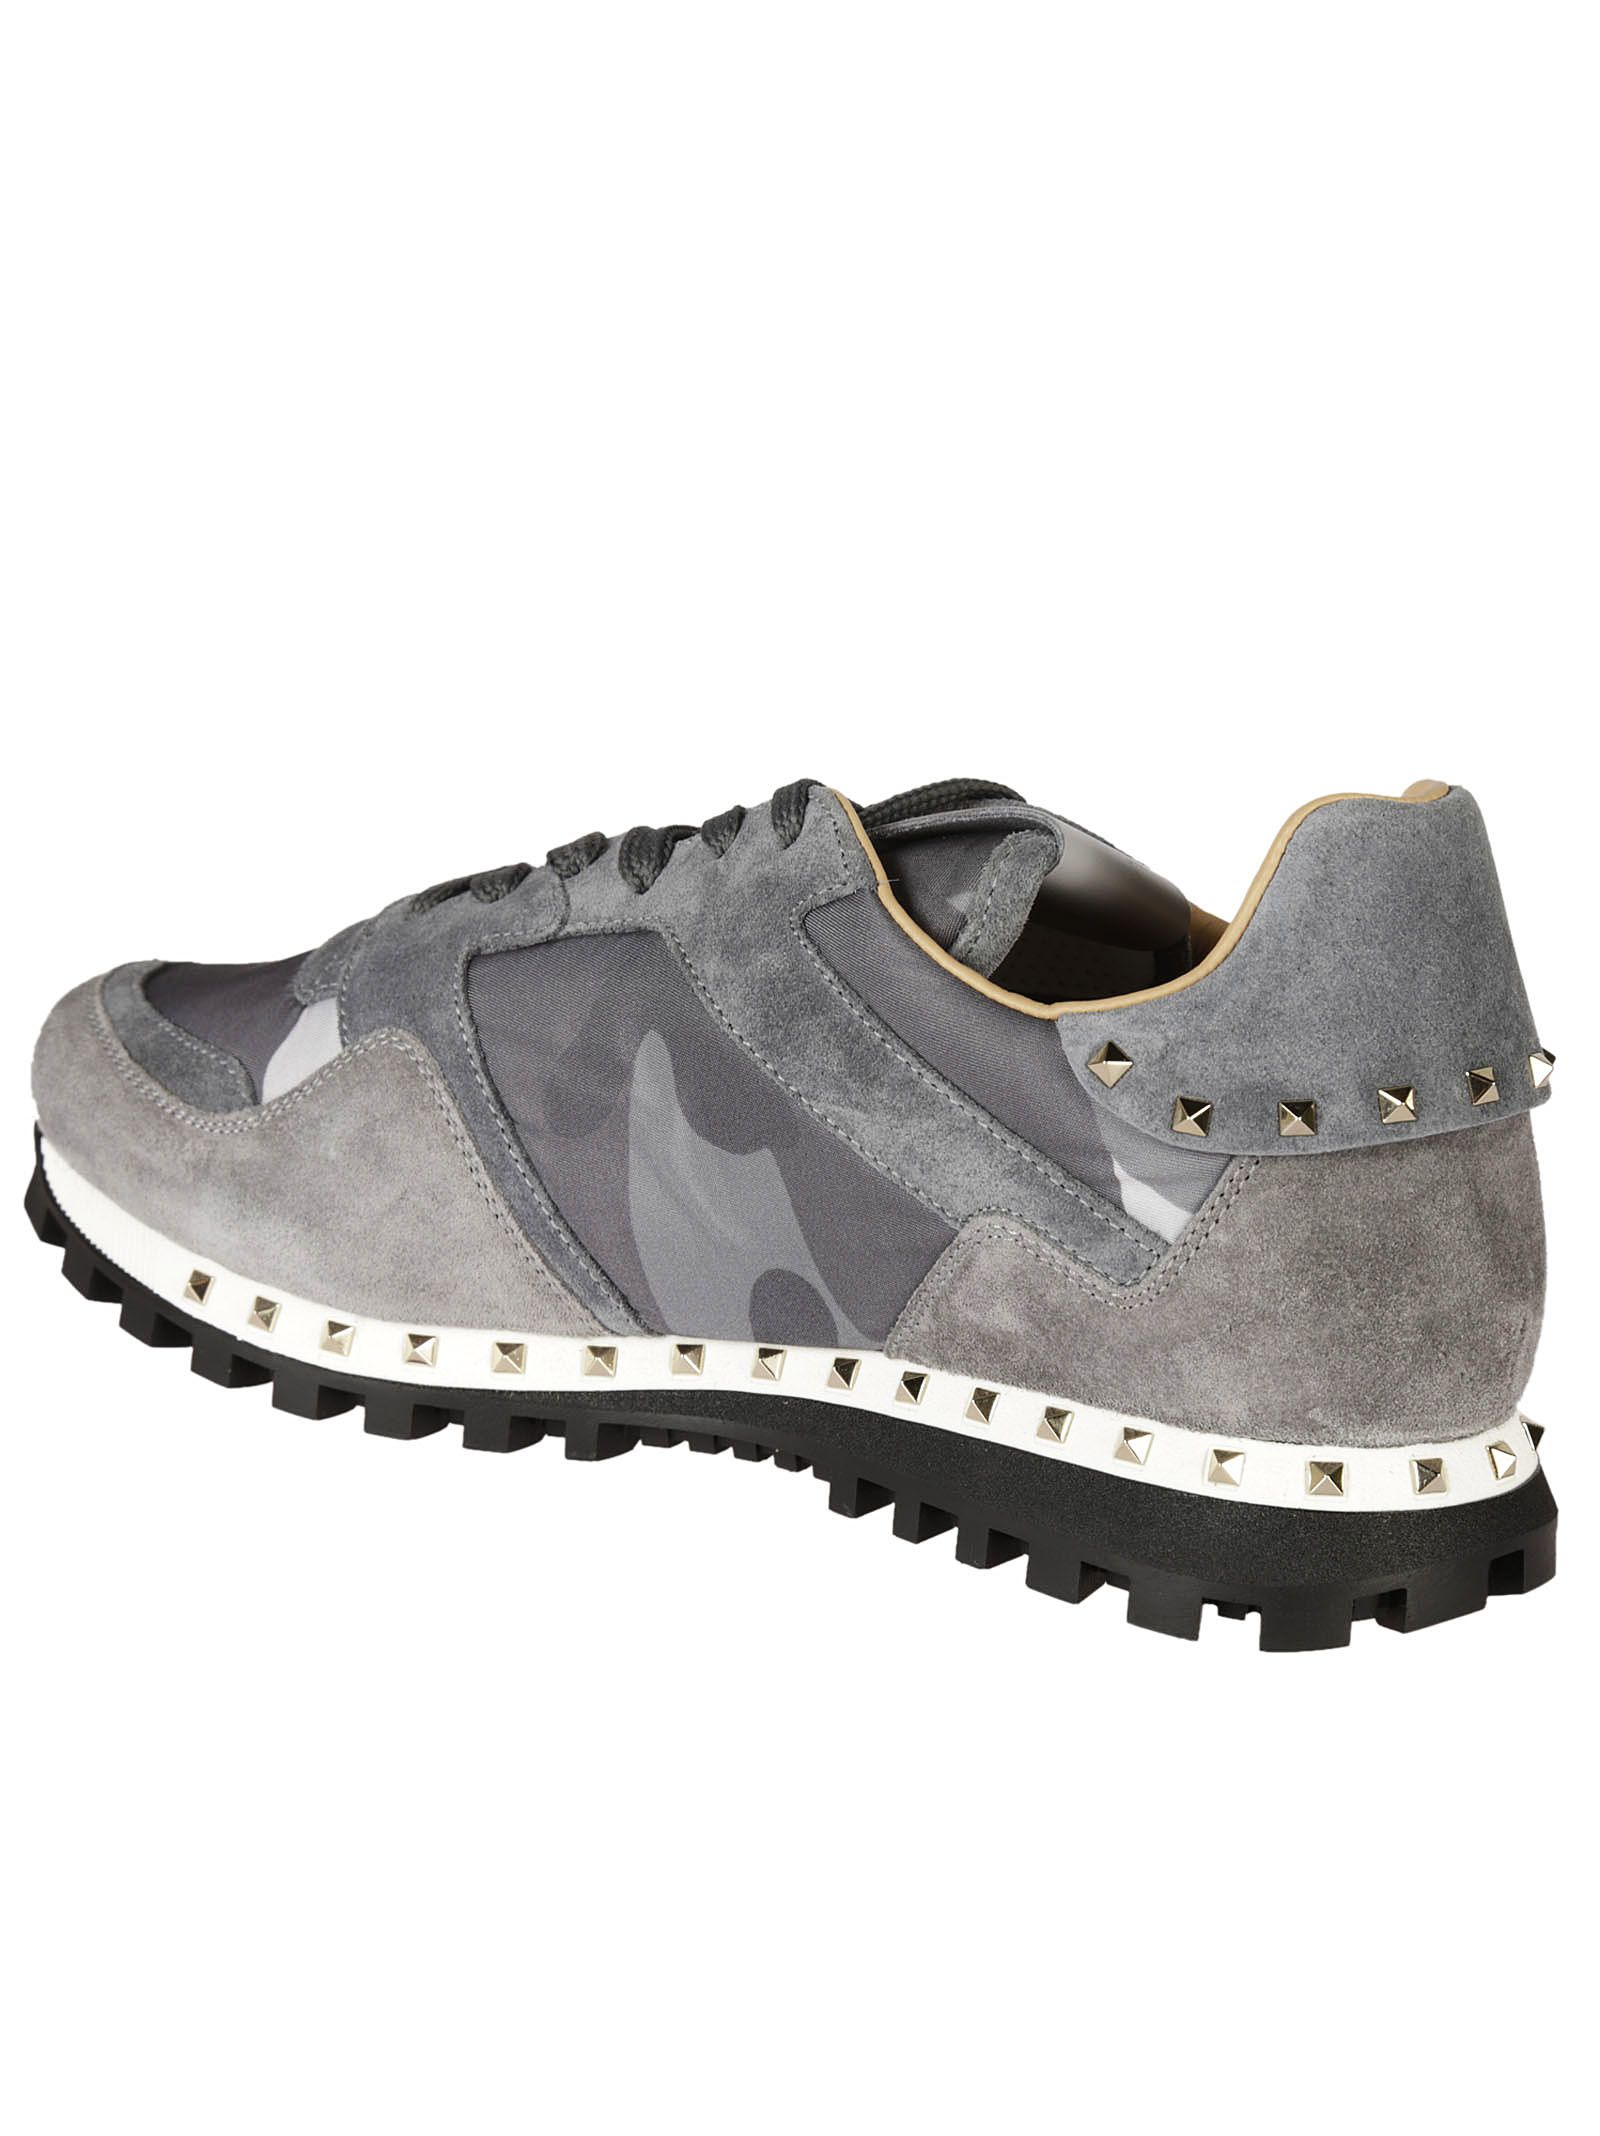 Valentino Garavani Valentino Garavani Rockstud Camouflage Sneakers